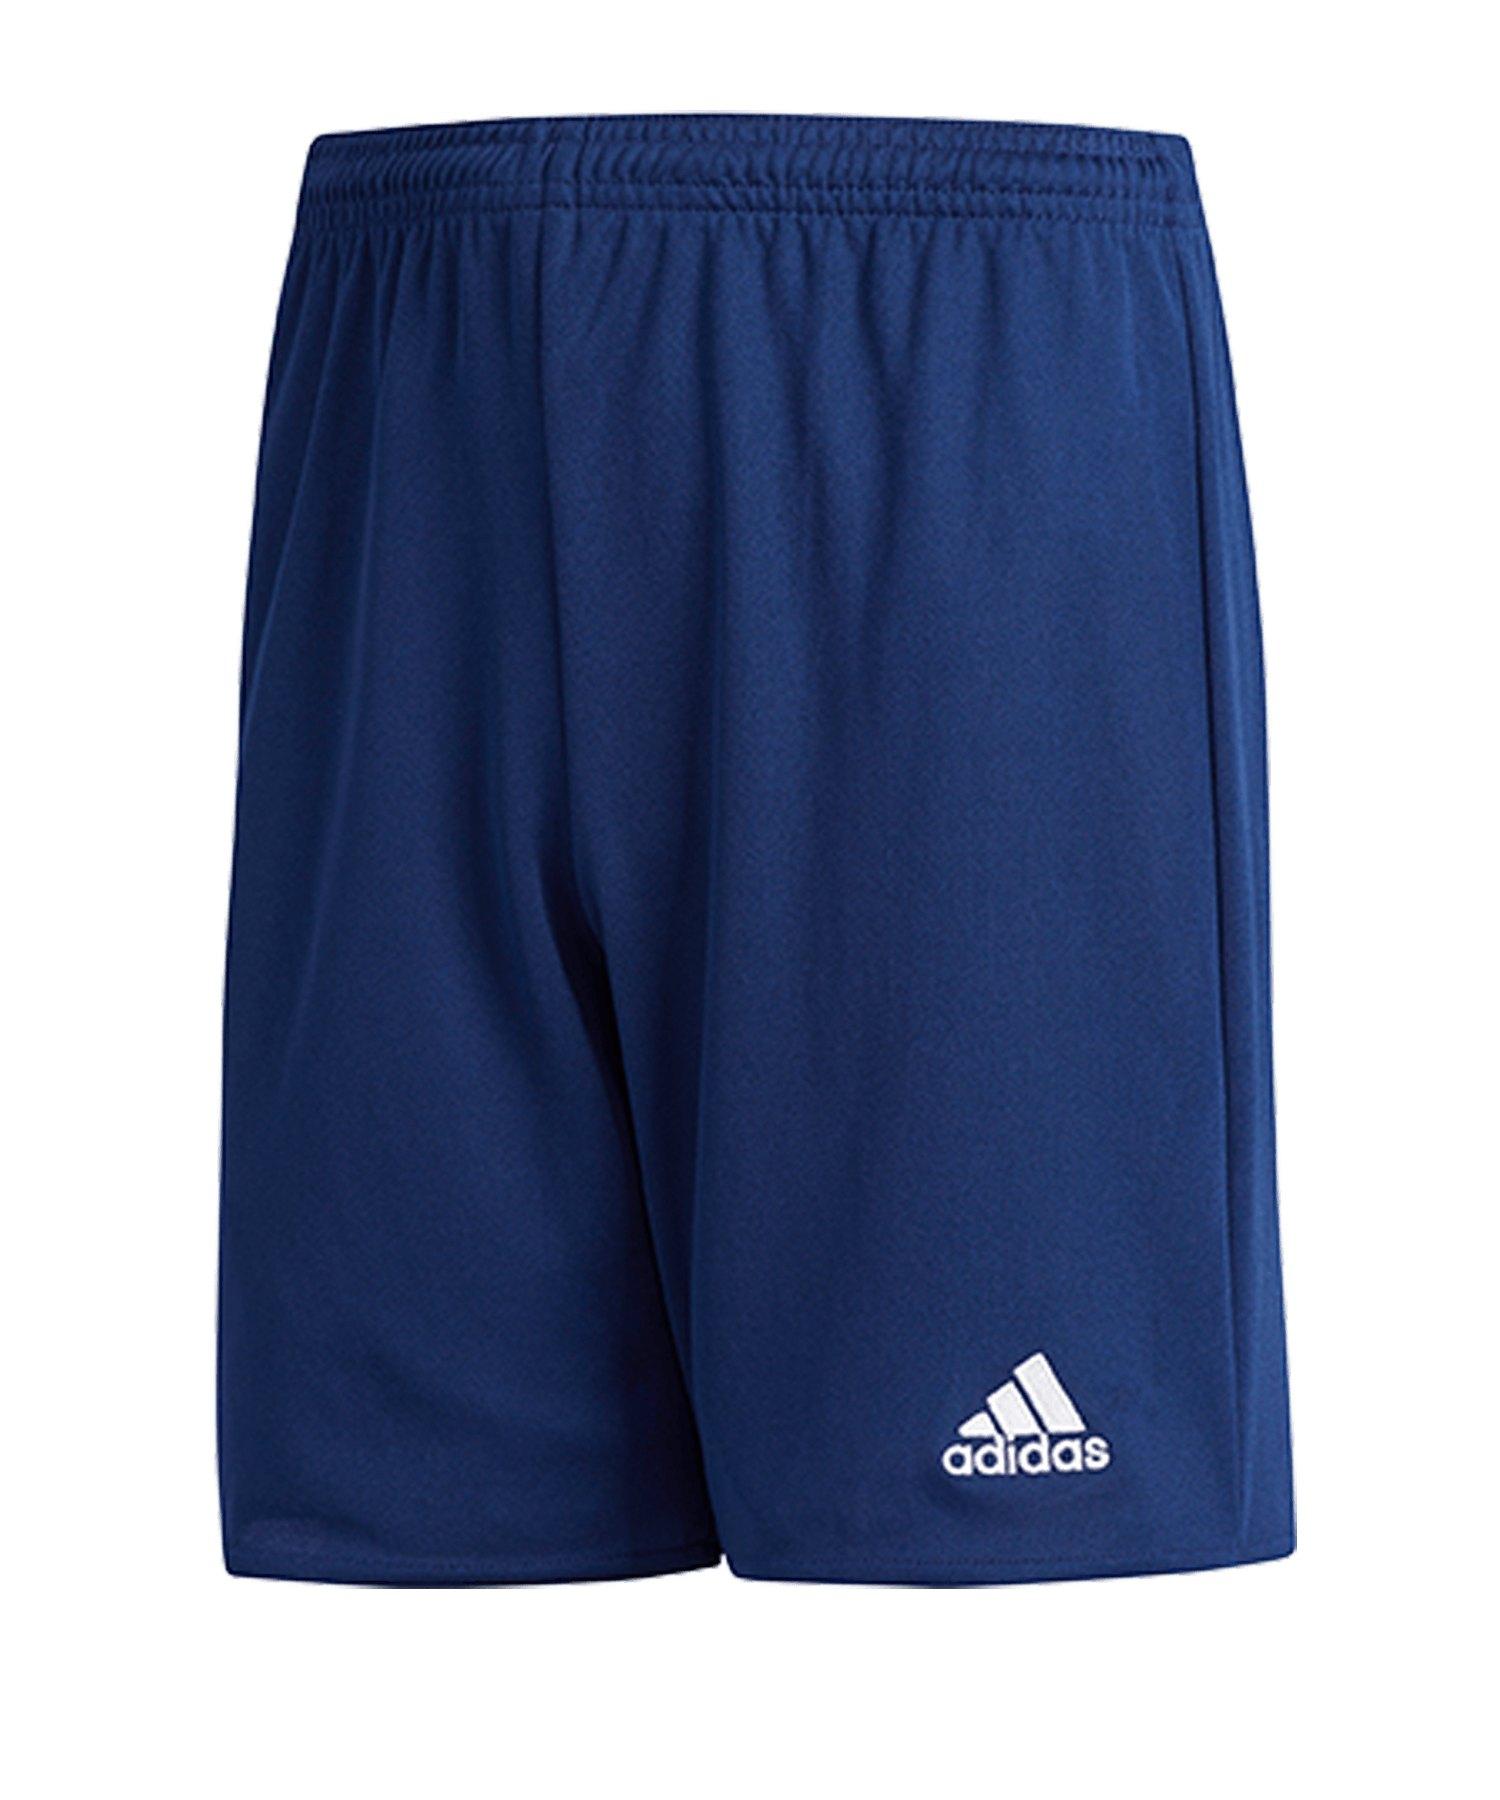 adidas Parma 16 Short KidsDunkelblau Weiss - blau